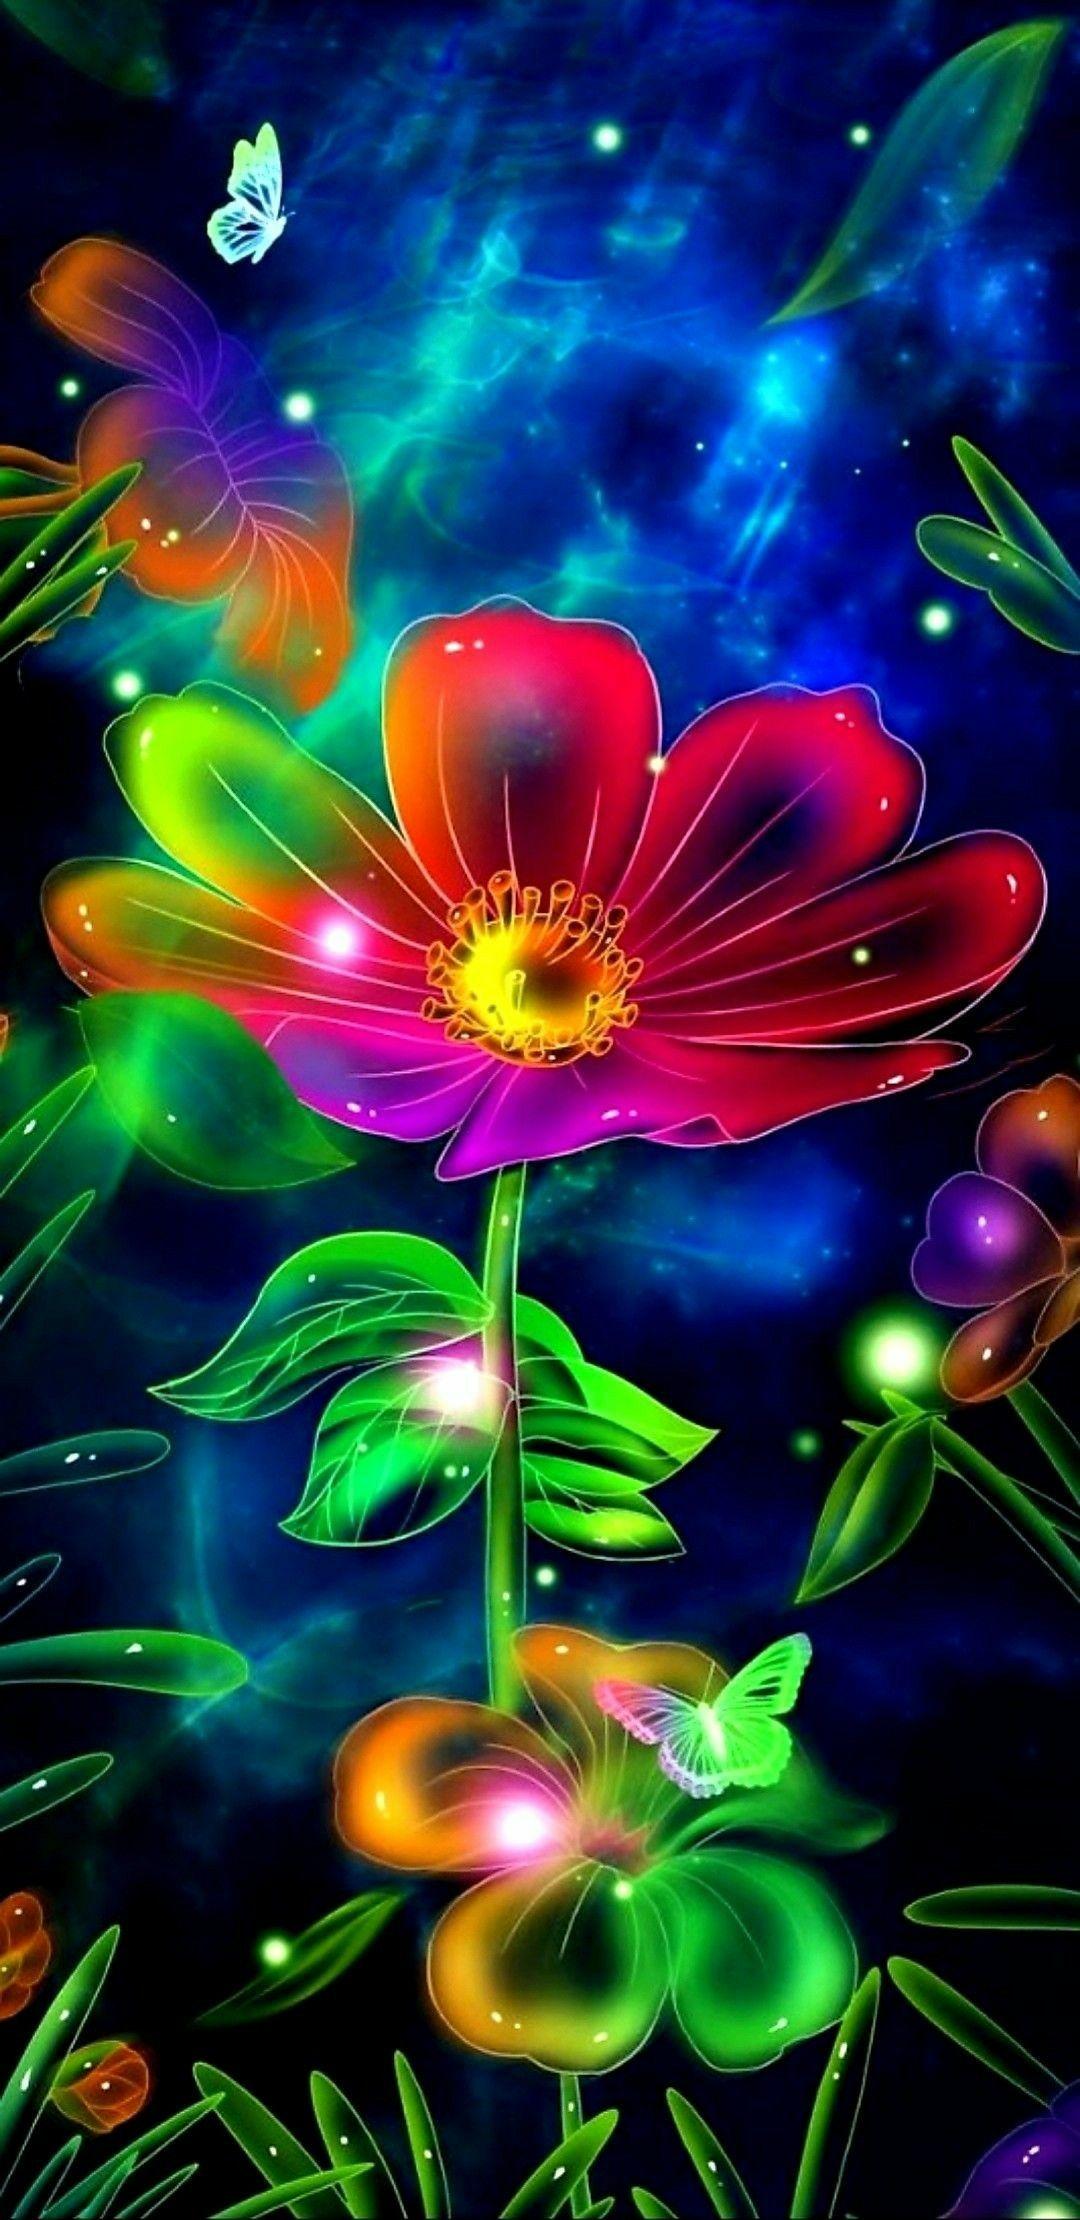 Neon Flower Abstract Art Images Flower Phone Wallpaper Neon Flowers